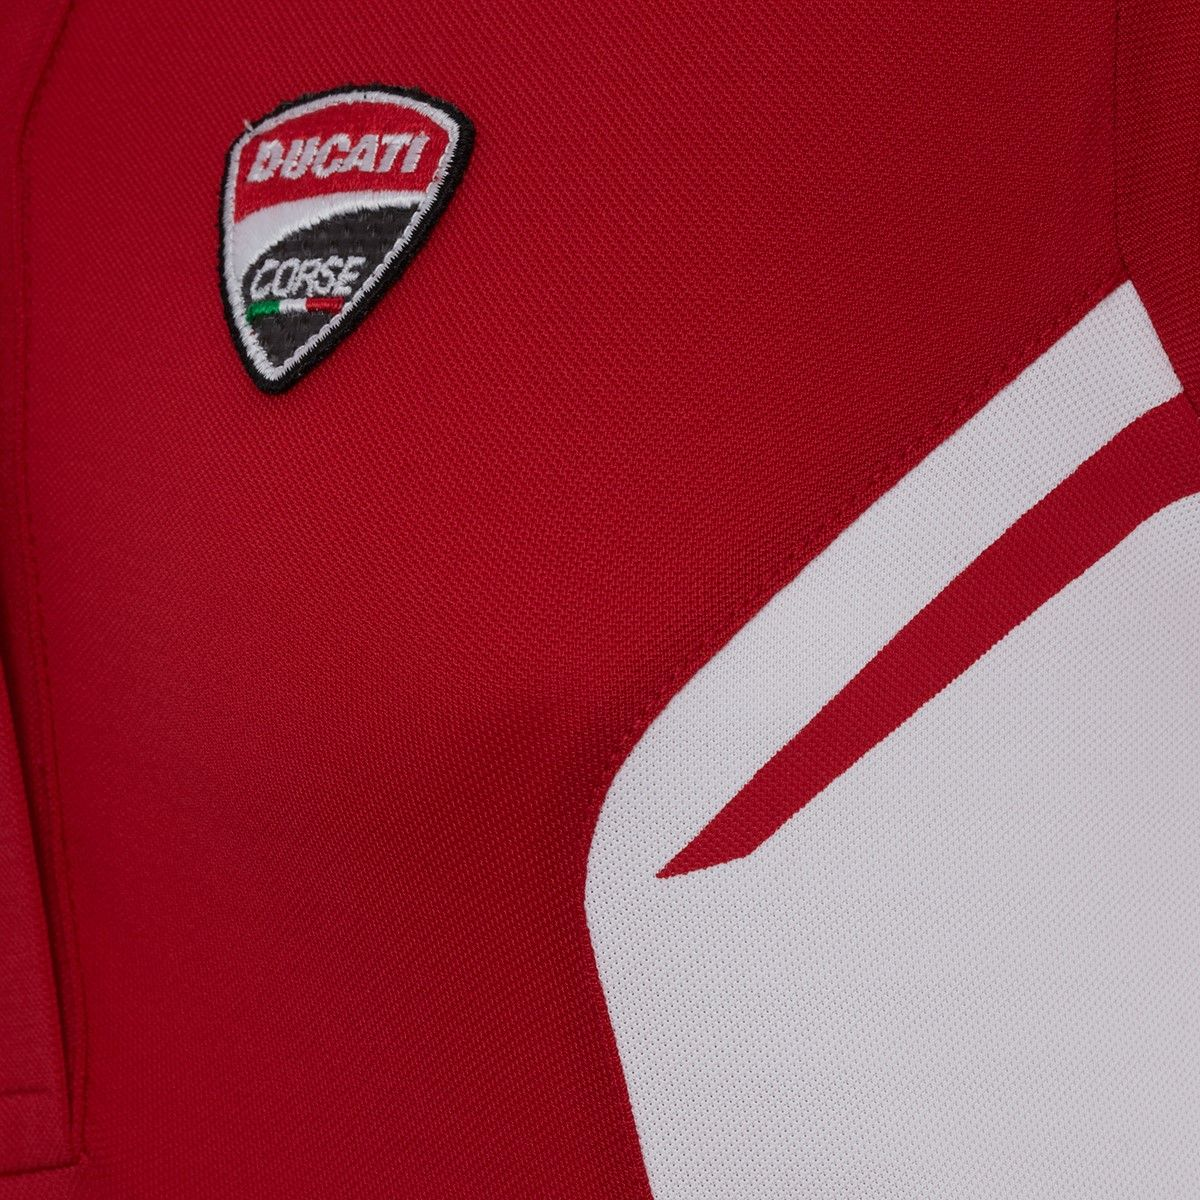 【DUCATI performance】Ducati Corse Polo衫 - 「Webike-摩托百貨」